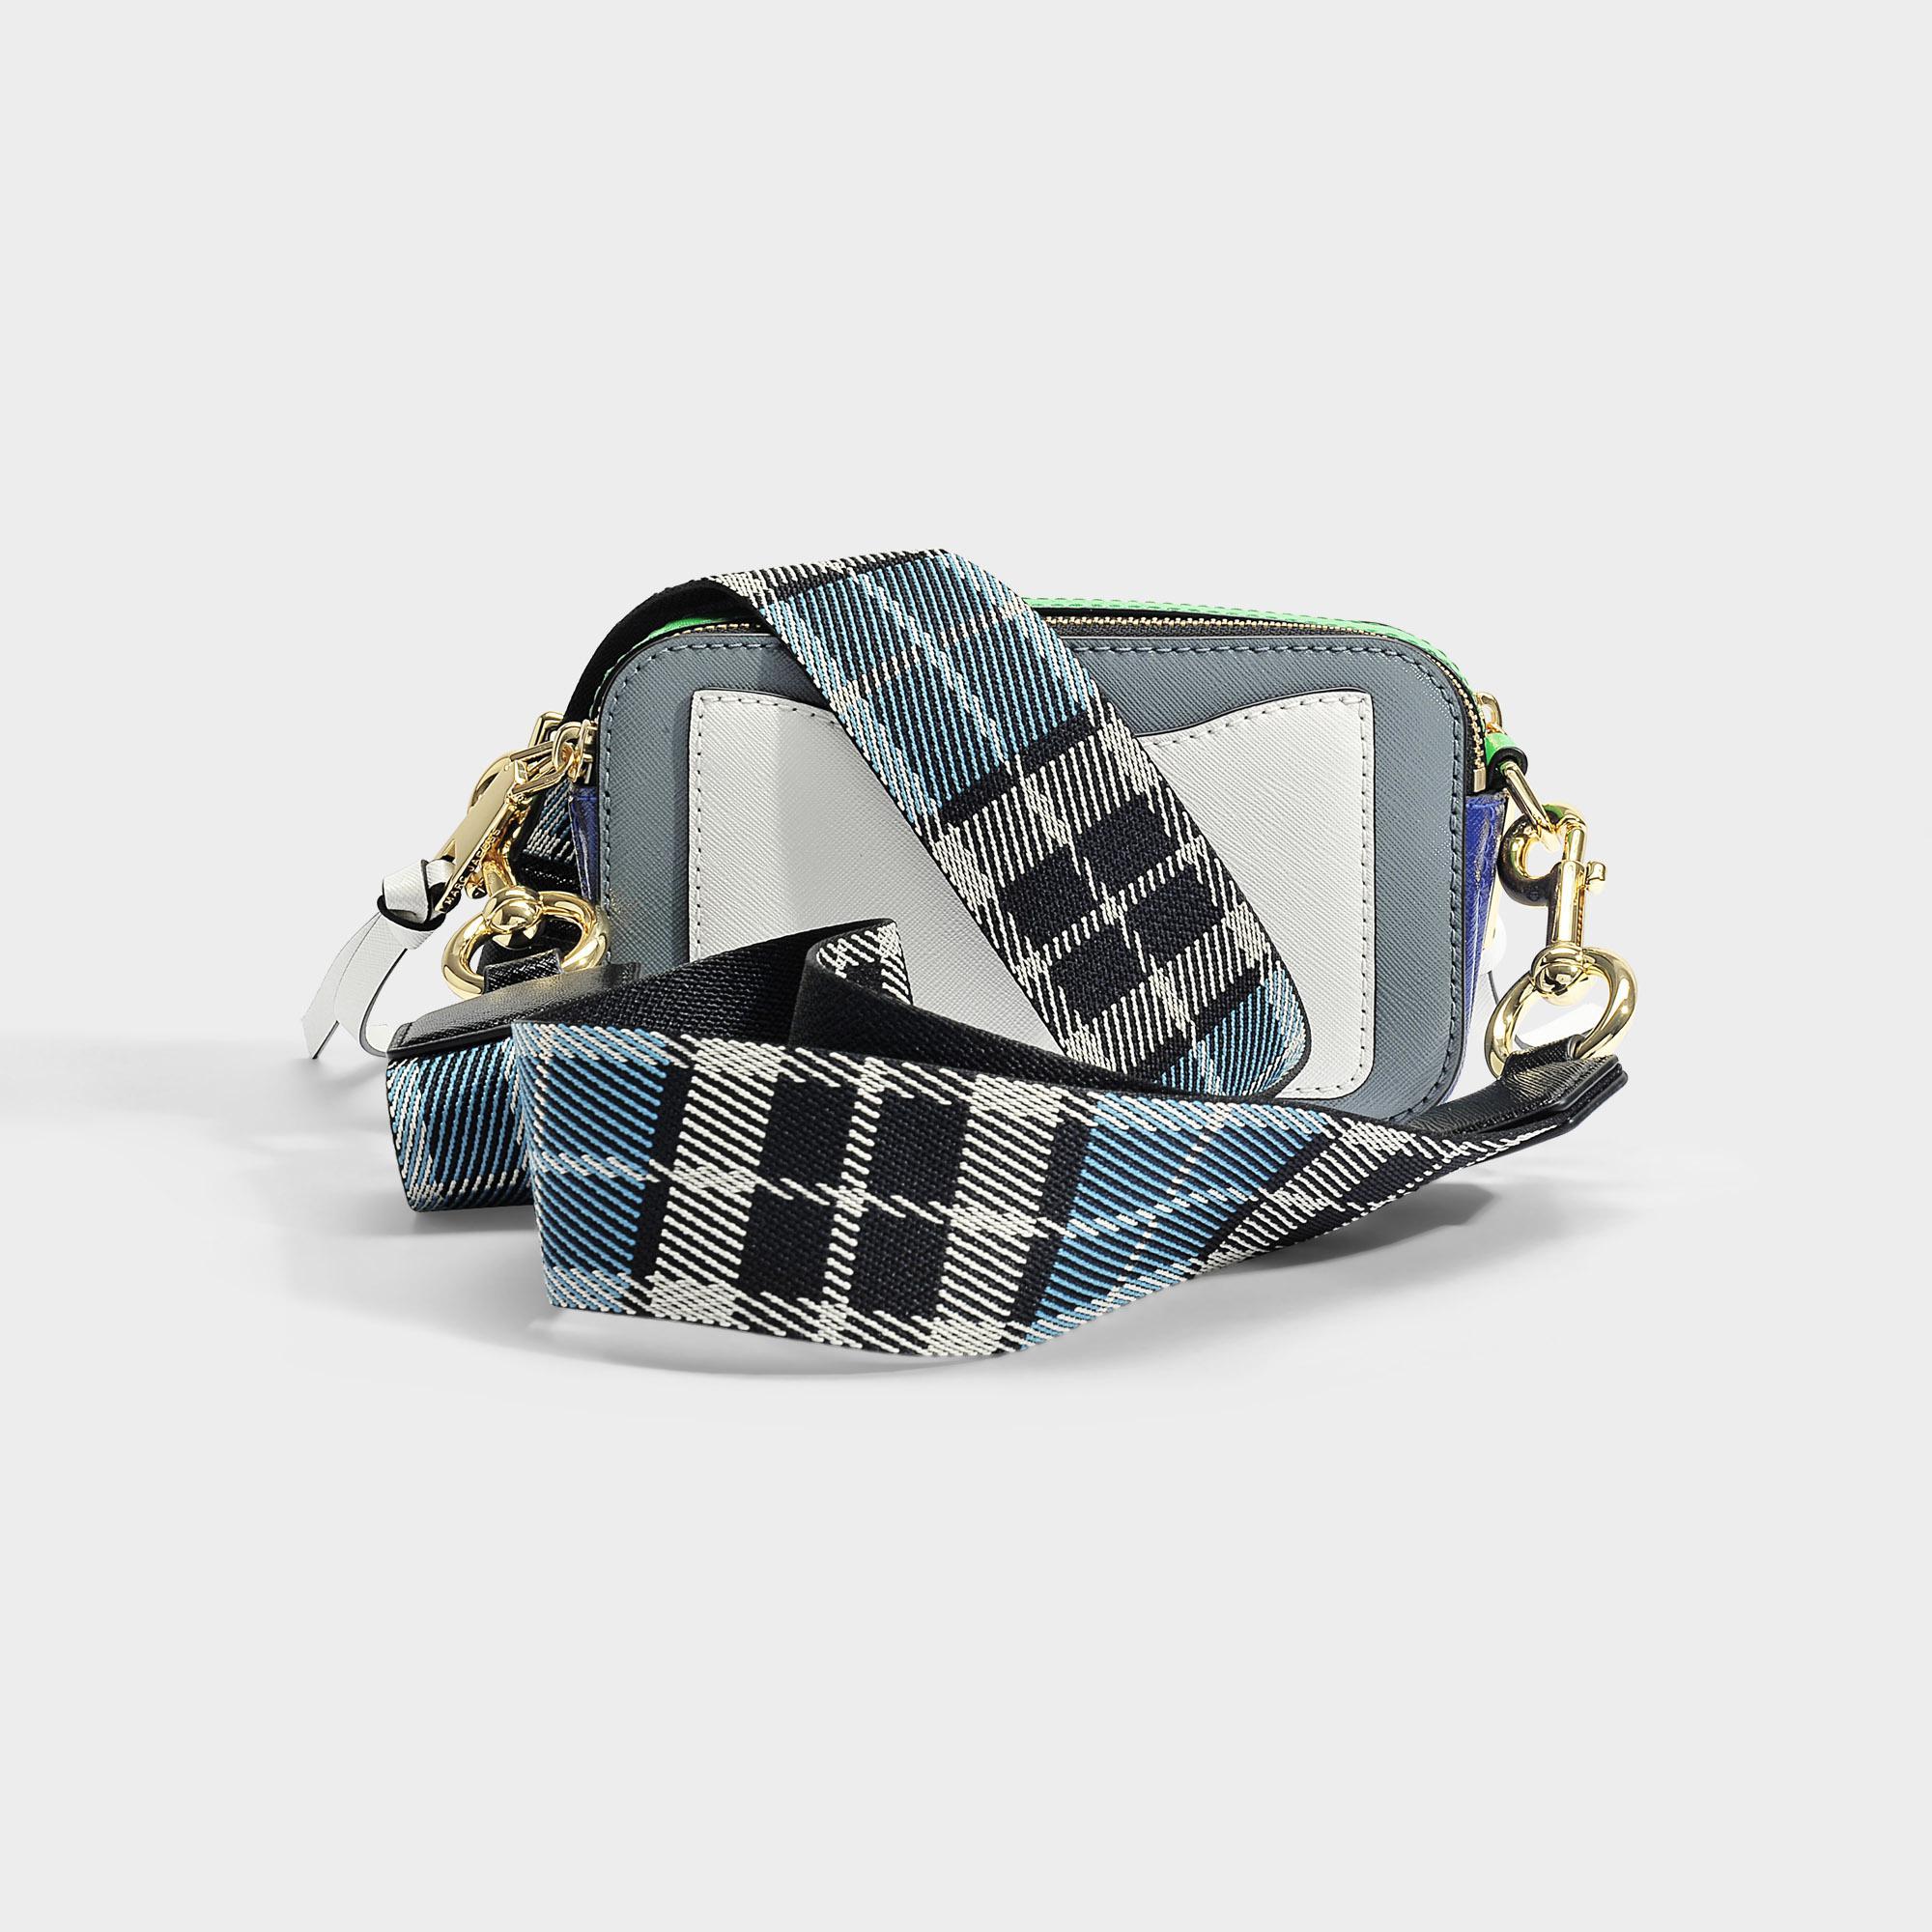 Marc Jacobs Snapshot Crossbody Bag In Multicolor Gray Polyurethane Coated Calfskin